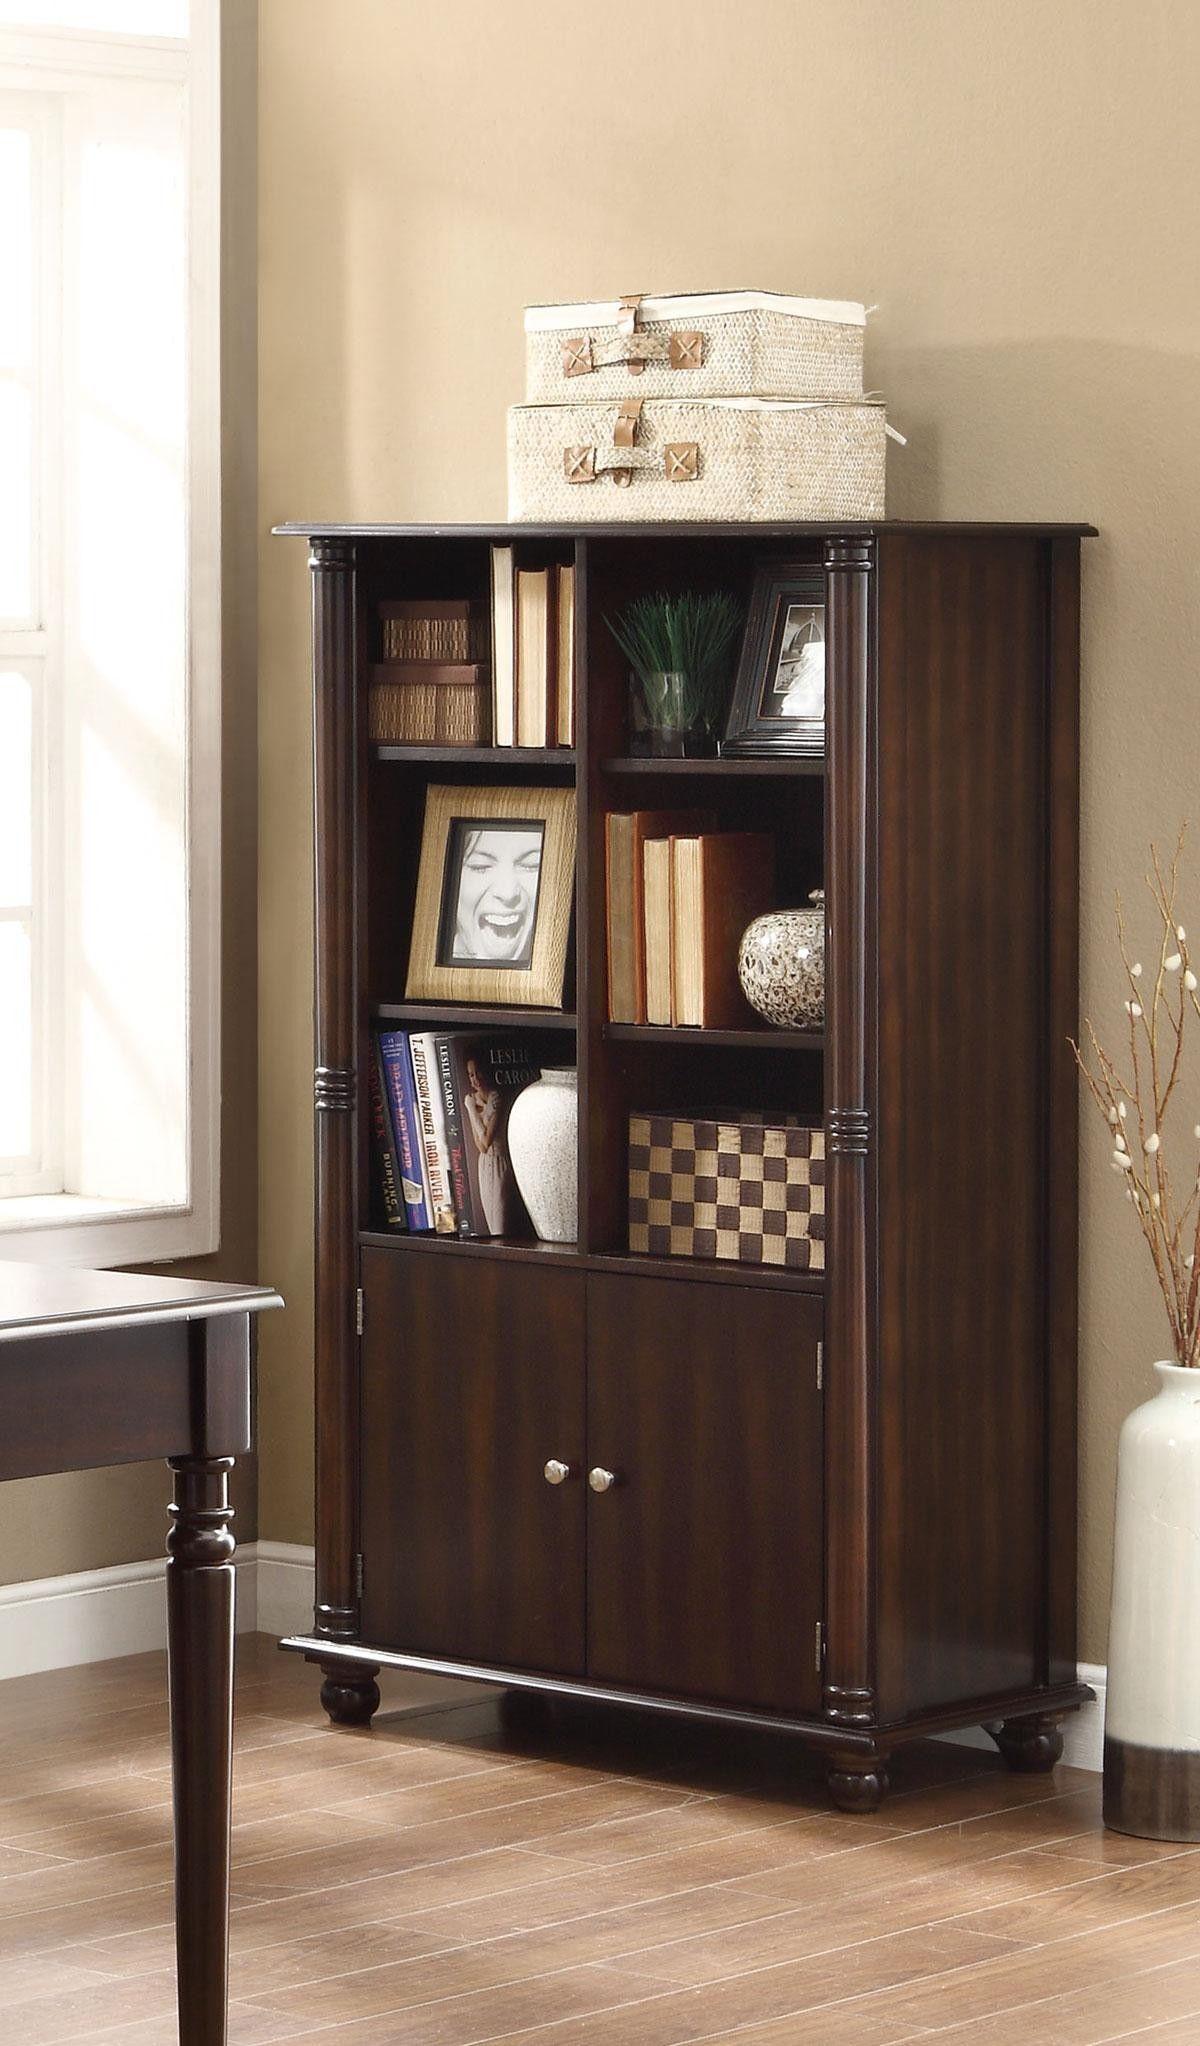 jacqueline three tiered bookshelf with cabinet no place like home rh pinterest com